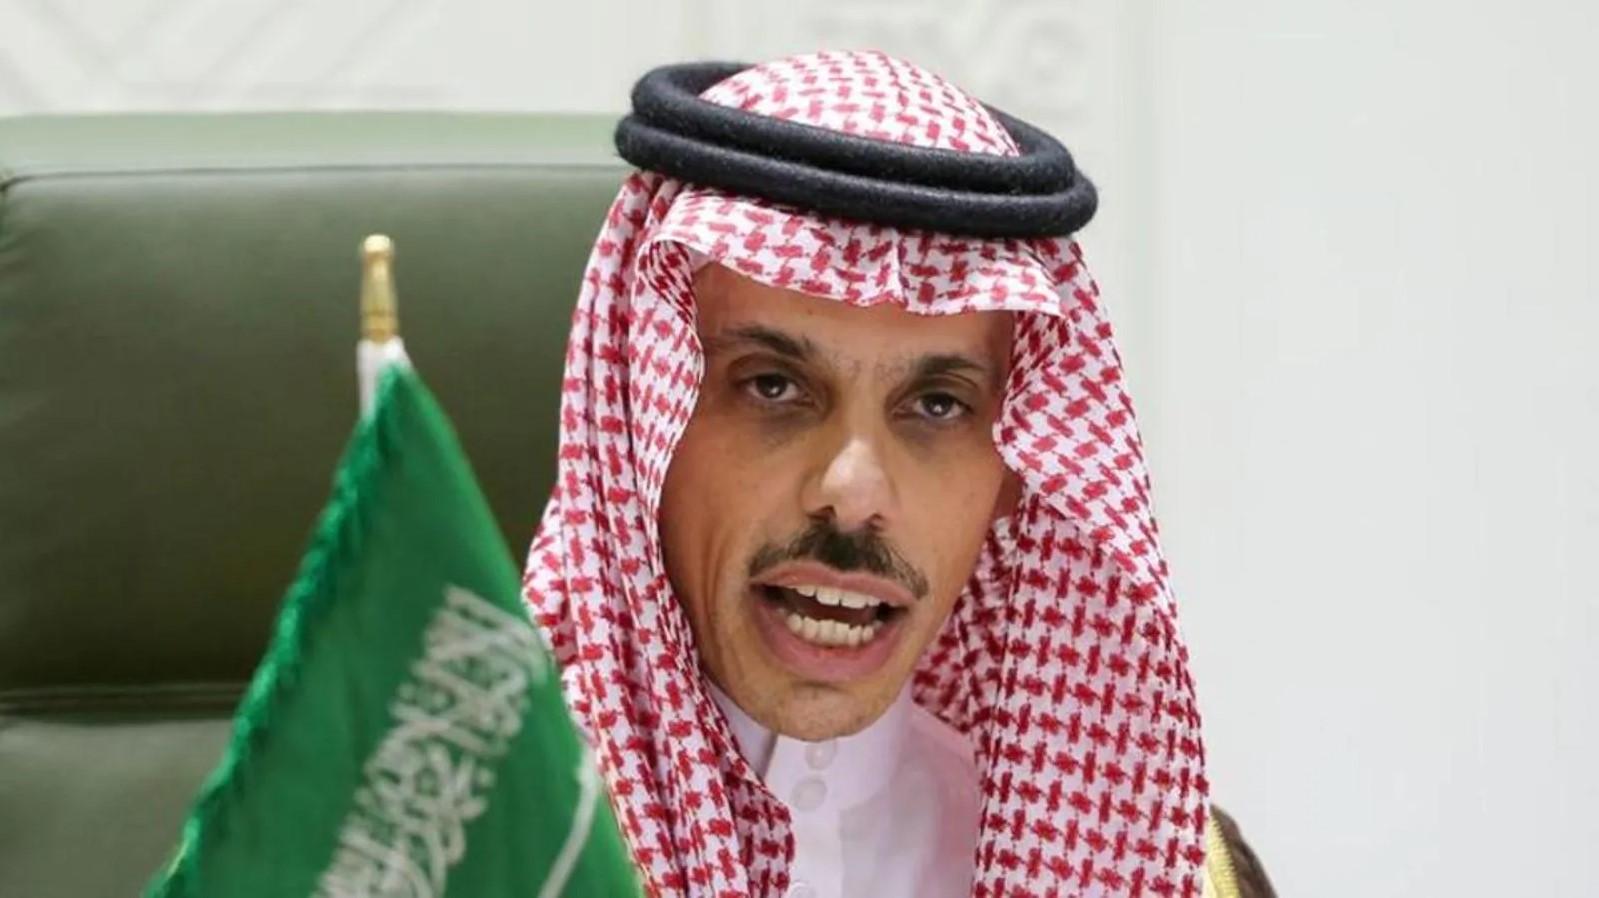 Saudi FM Prince Faisal bin Farhan Al Saud to visit India